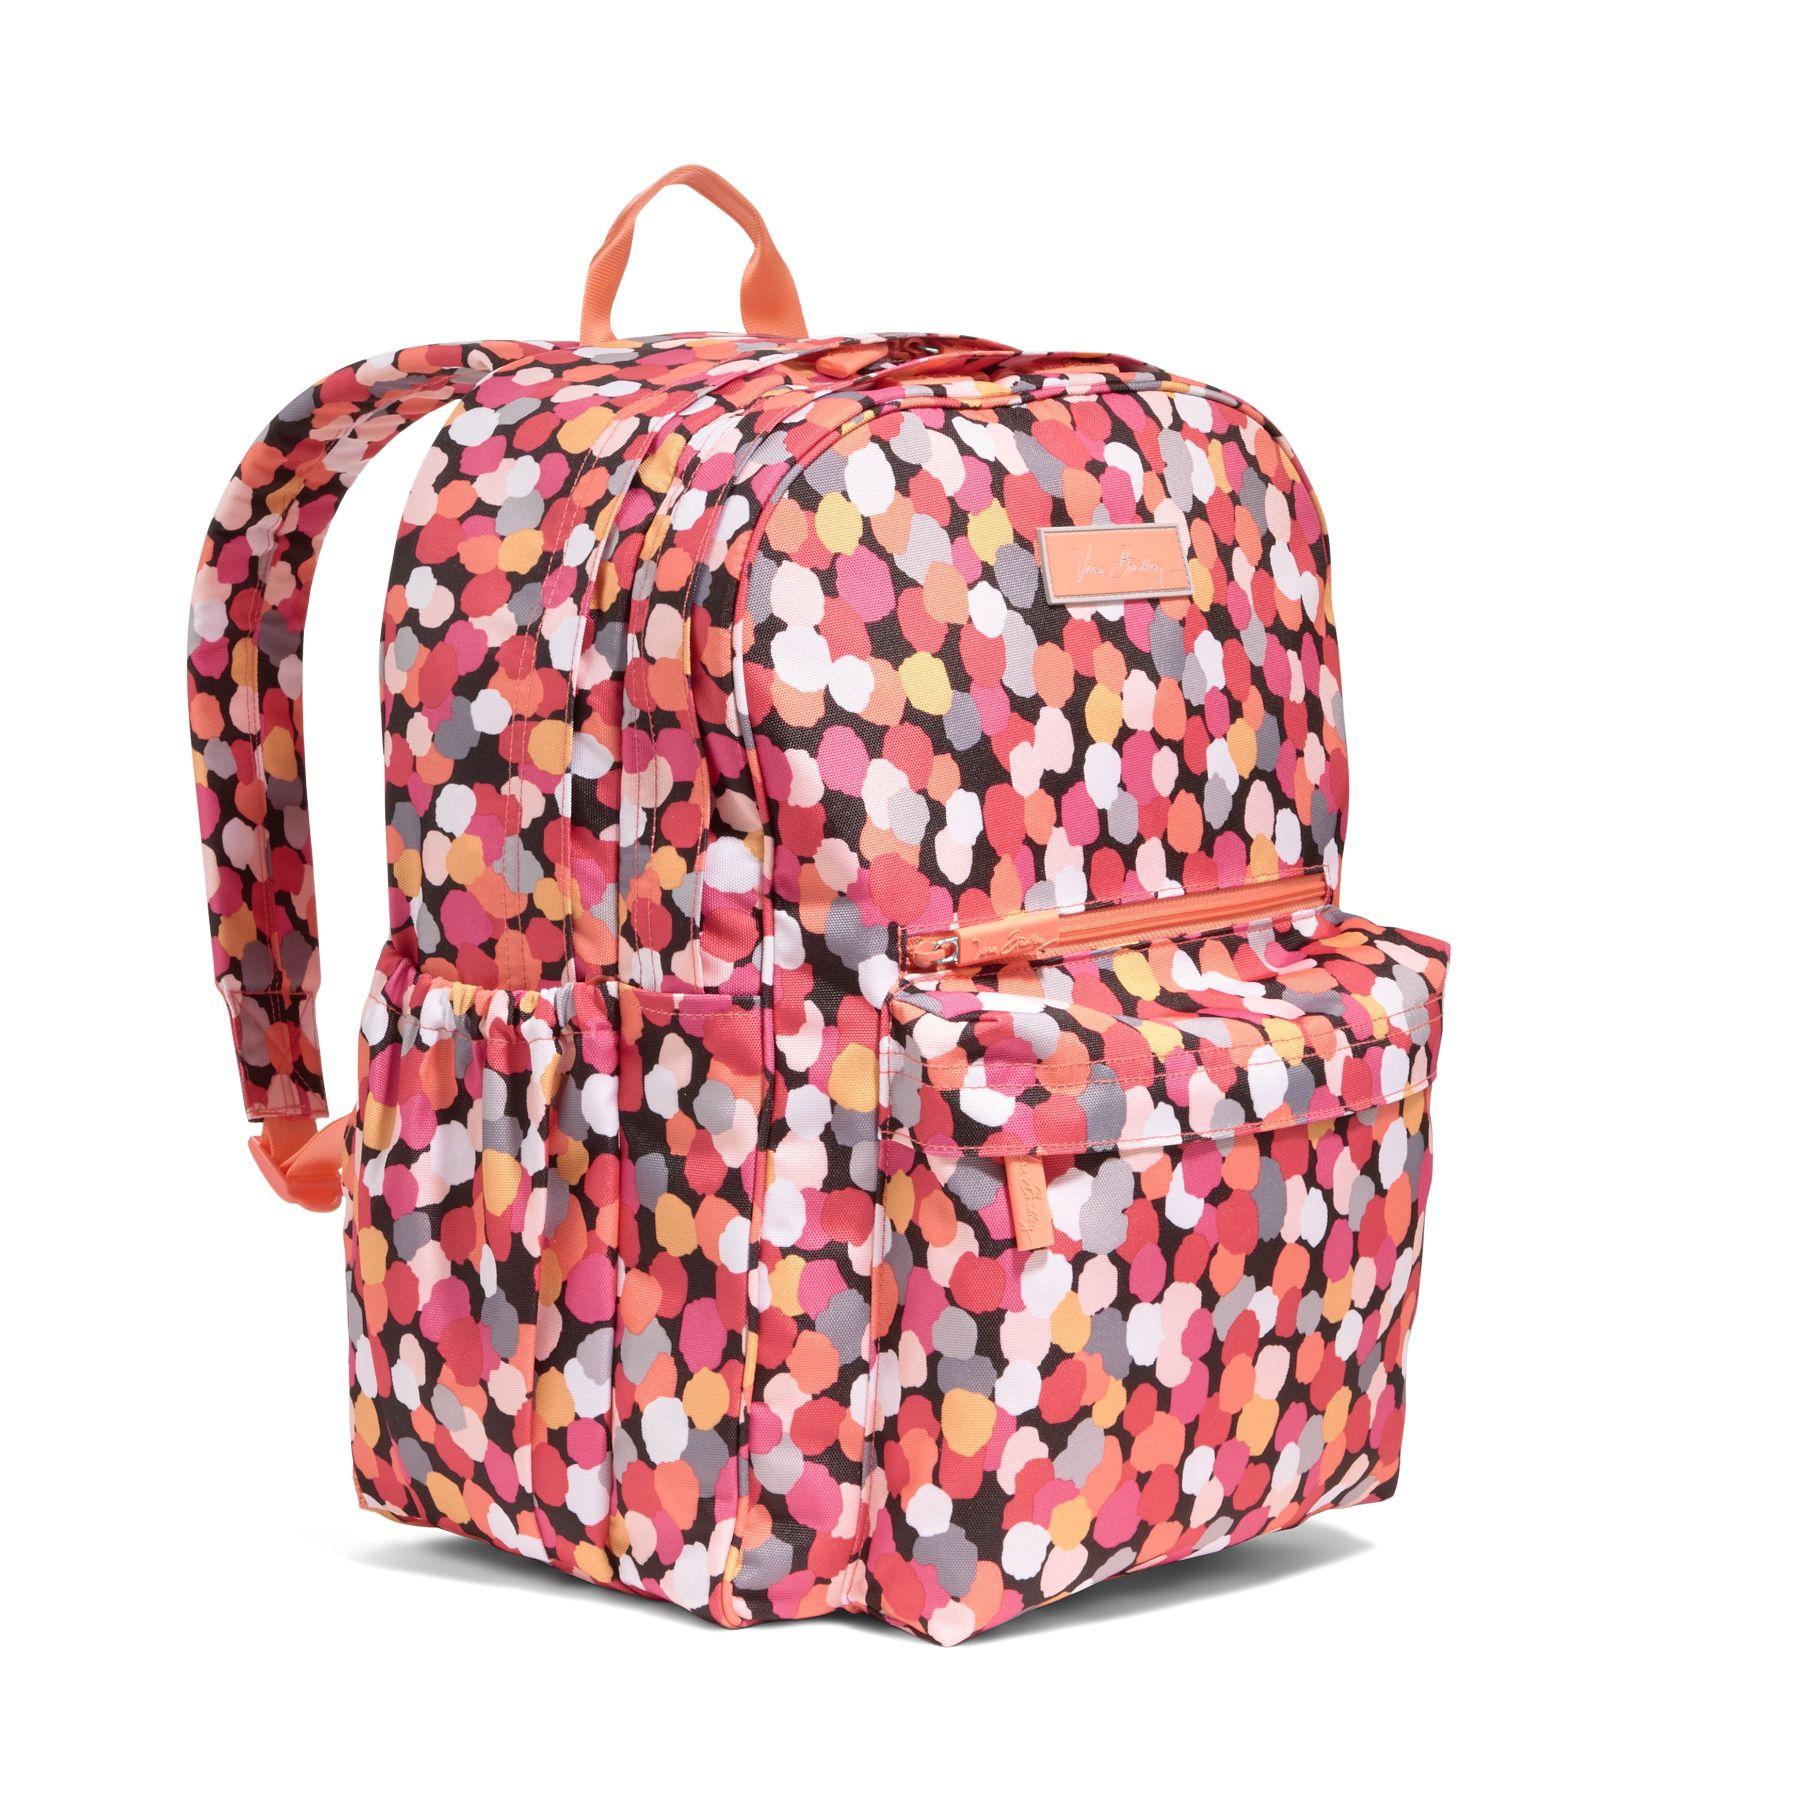 03853845b2f4 Vera Bradley Lighten Up Grande Backpack Bag